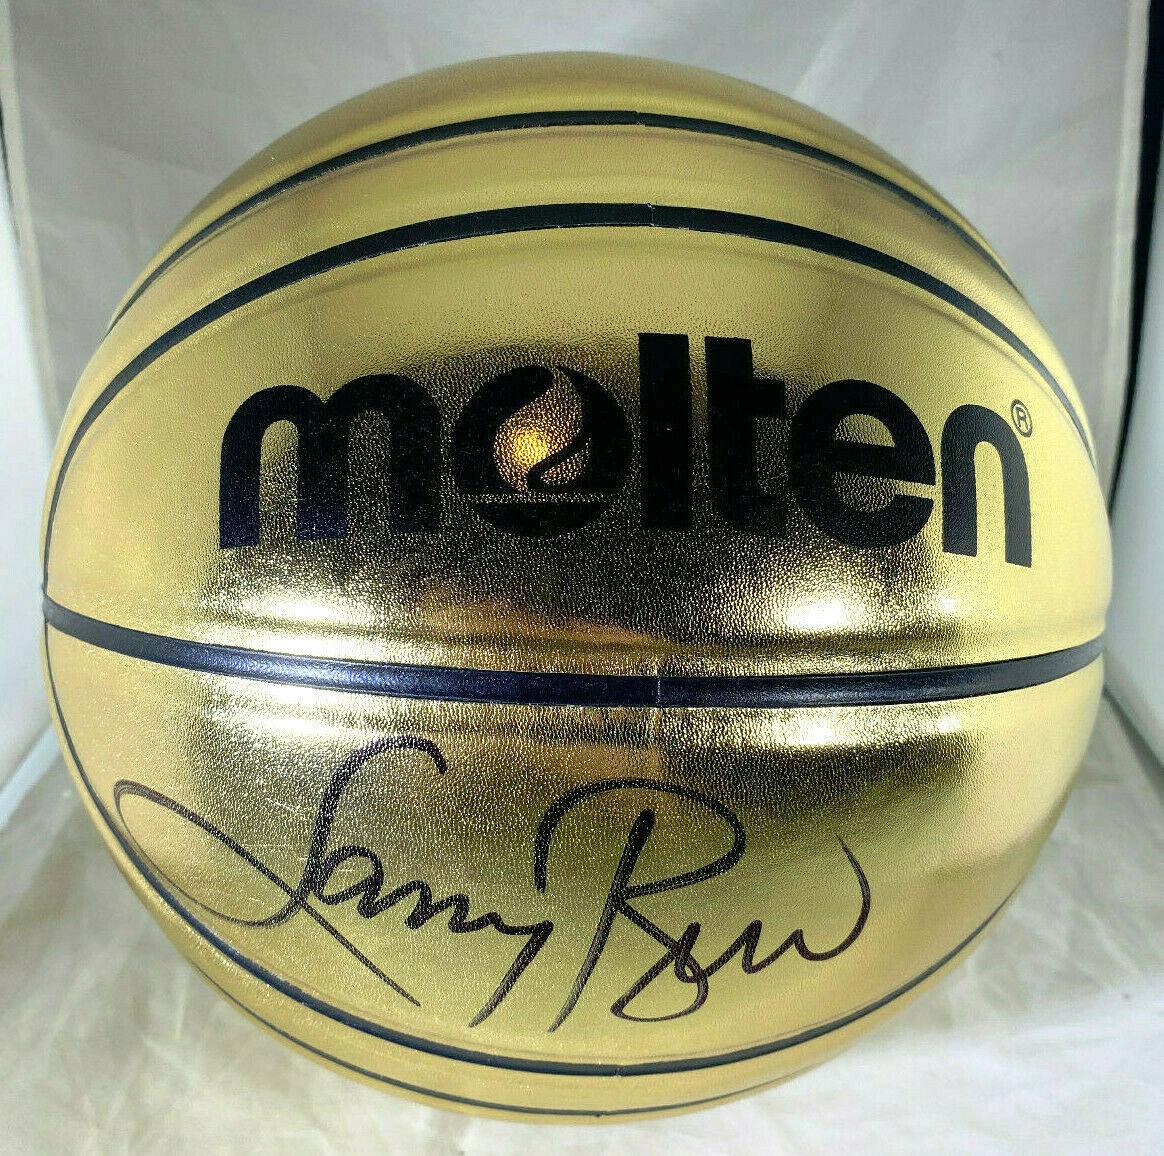 LARRY BIRD / NBA H.O.F. / AUTOGRAPHED MOLTEN GOLD FULL SIZE BASKETBALL / JSA COA